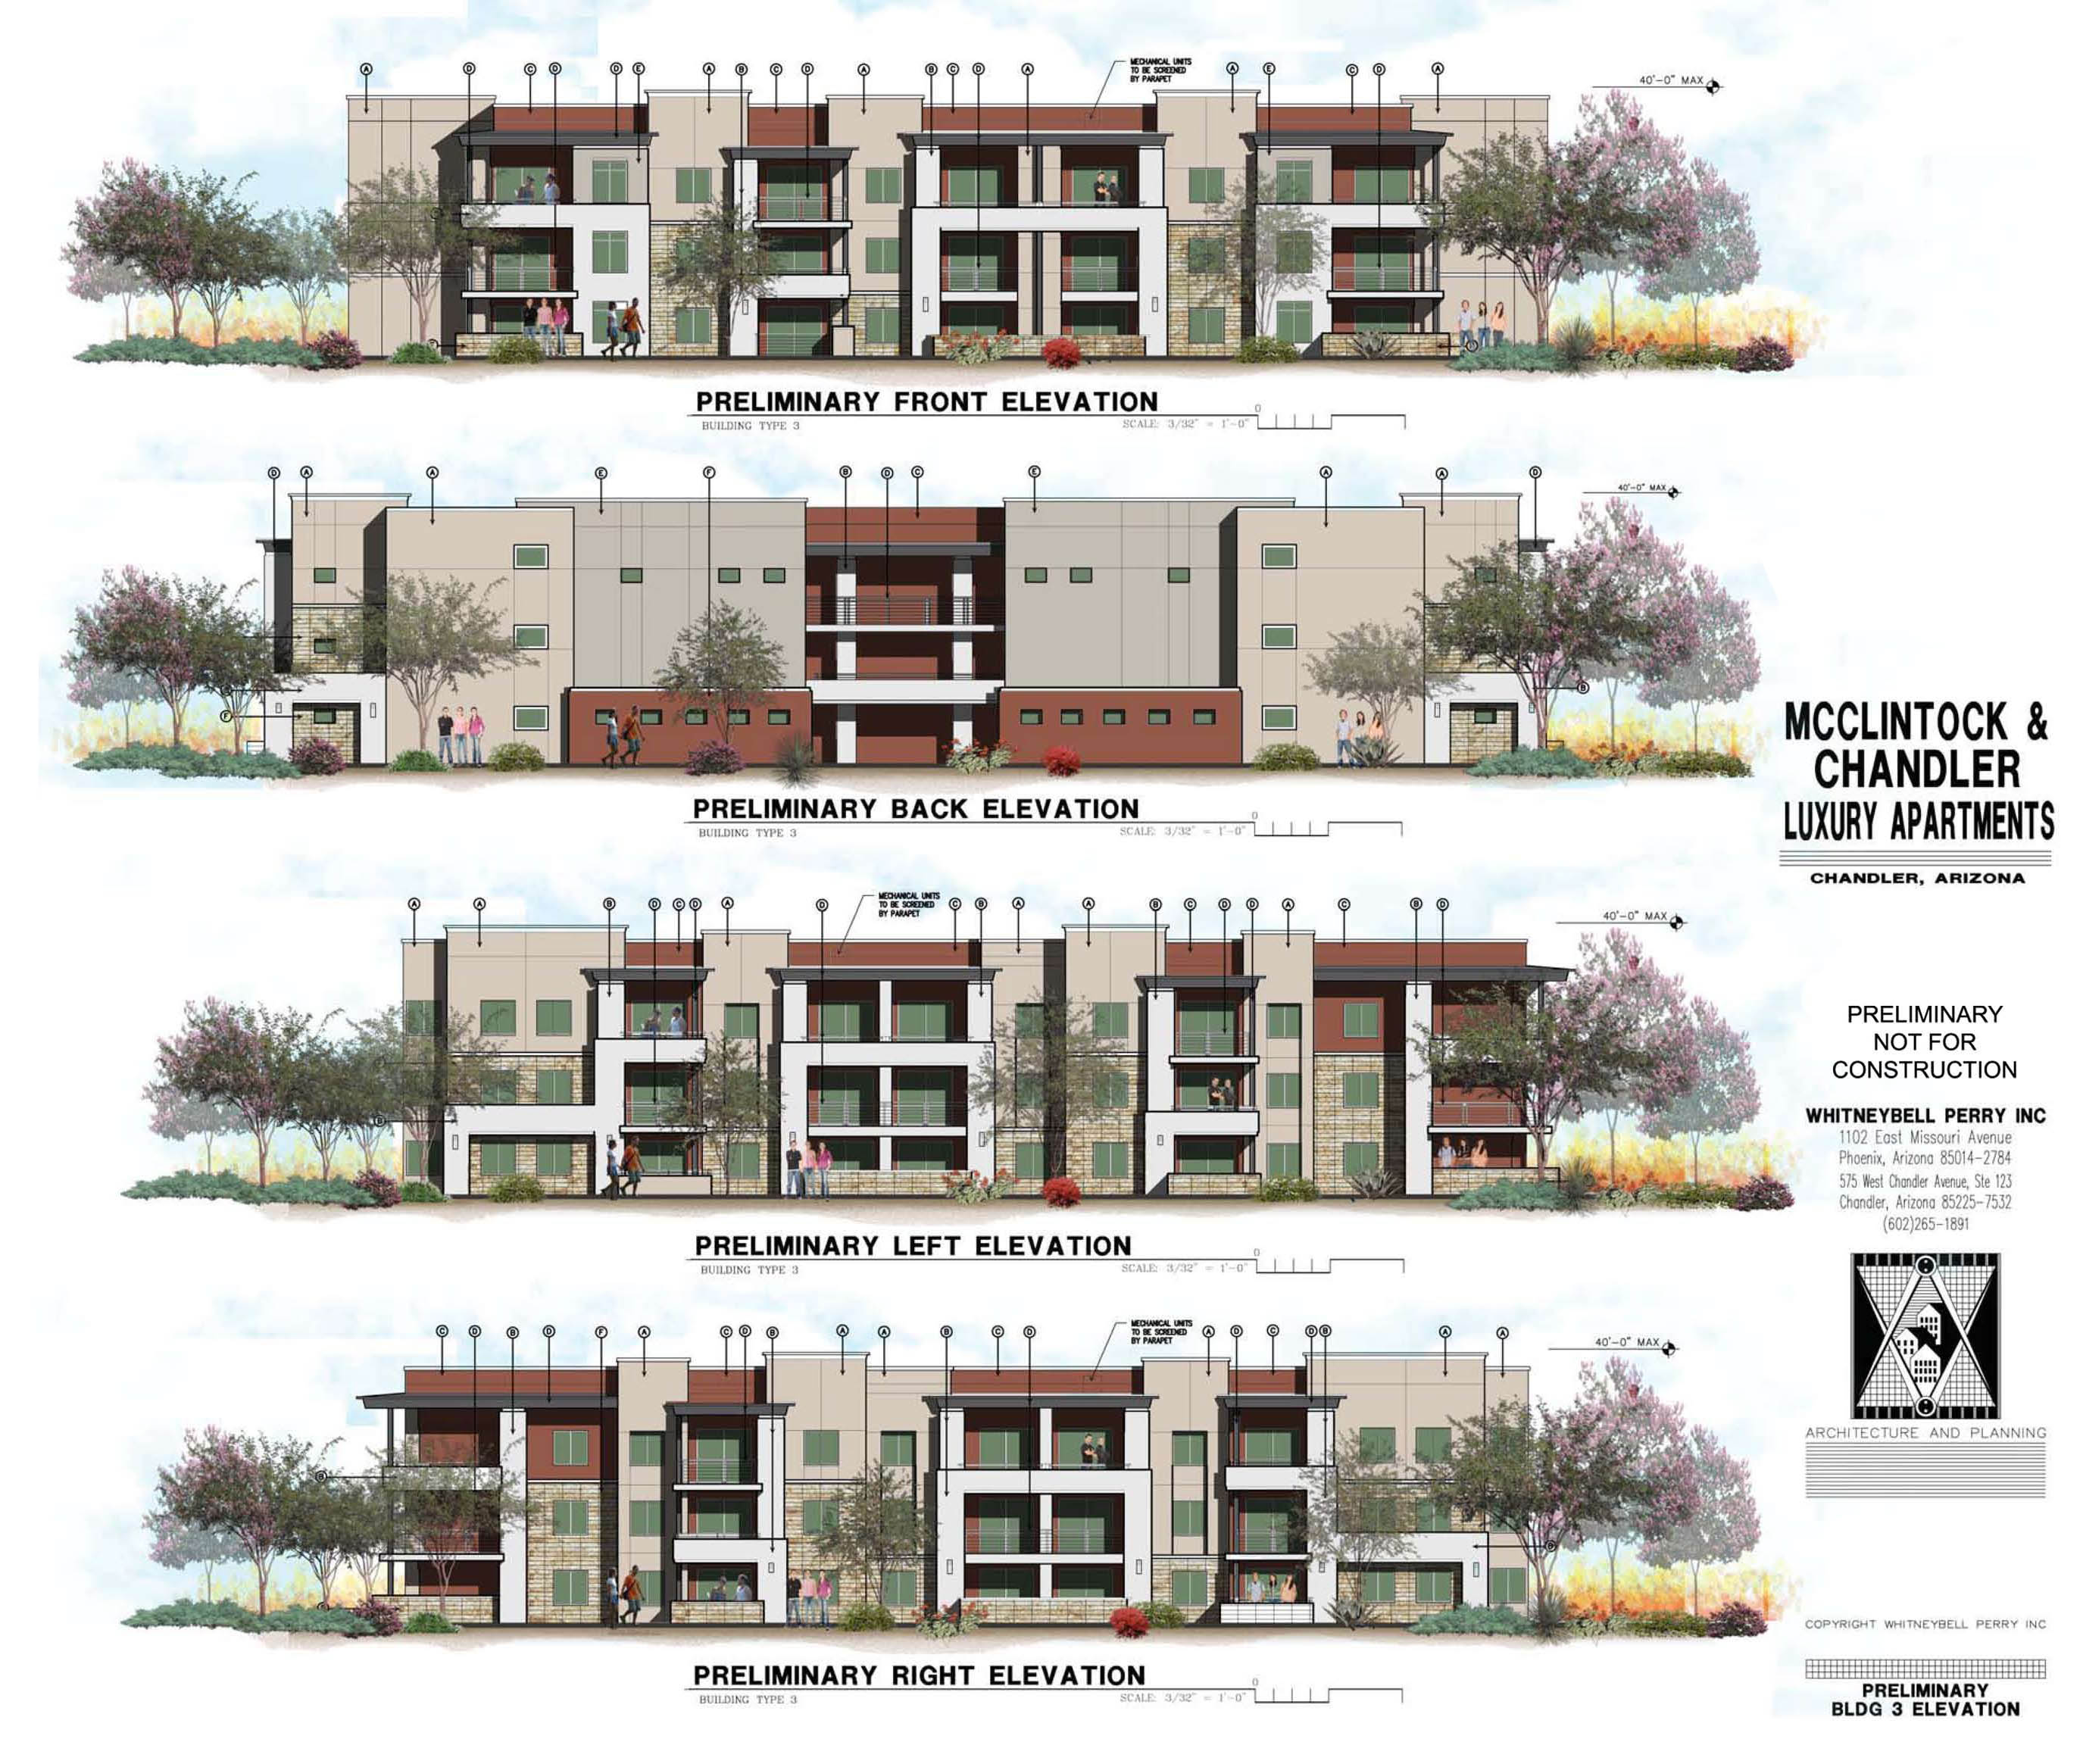 Chandler Apartments: Chandler McClintock Apartments